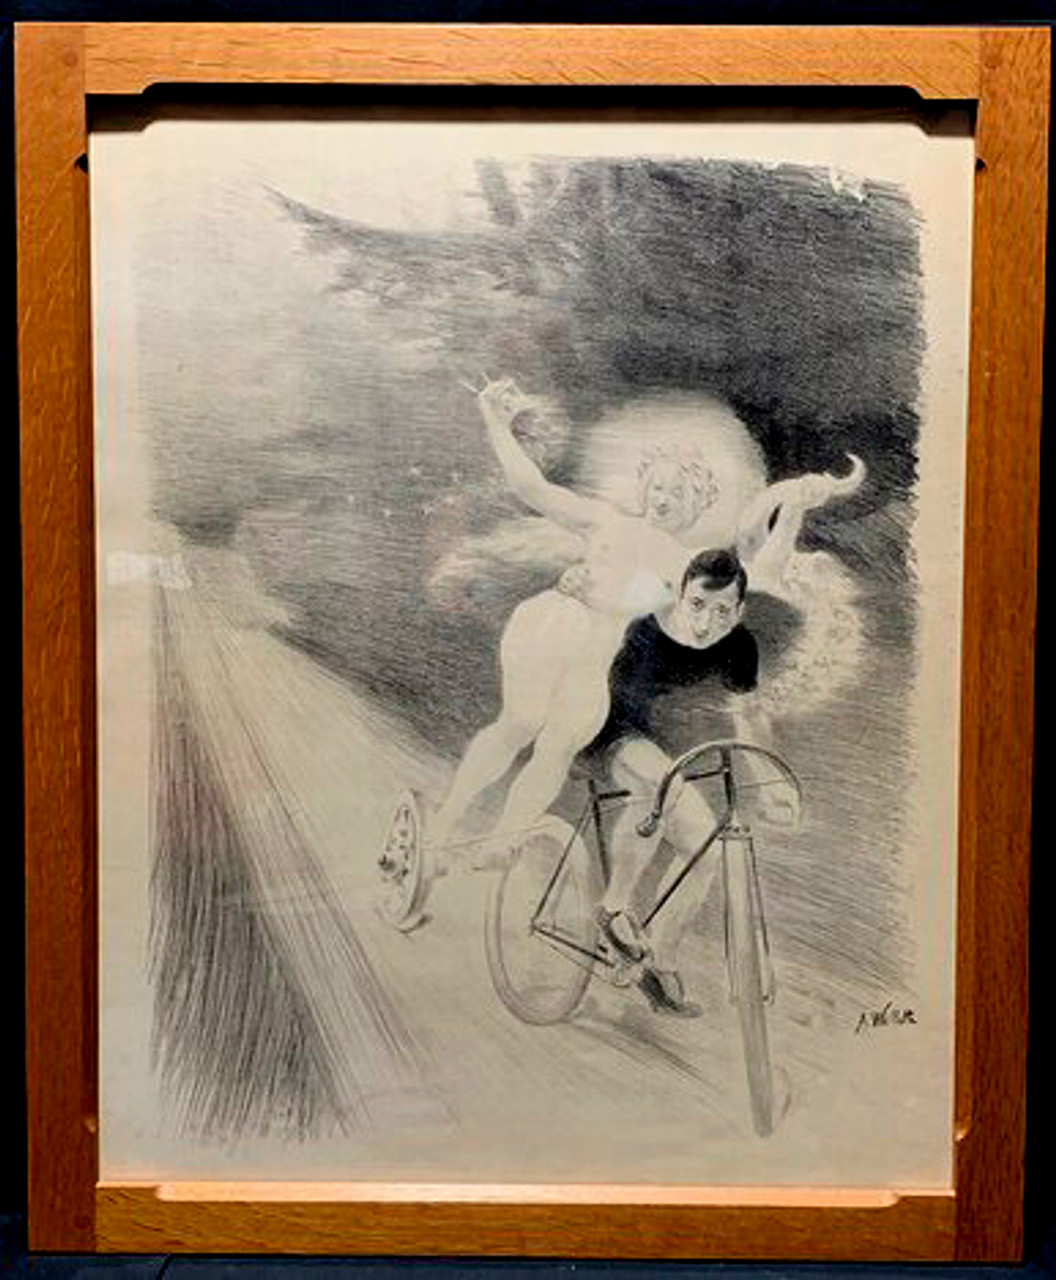 Bicycle Dreams Original Vintage  Bicycle Poster by A. Willet